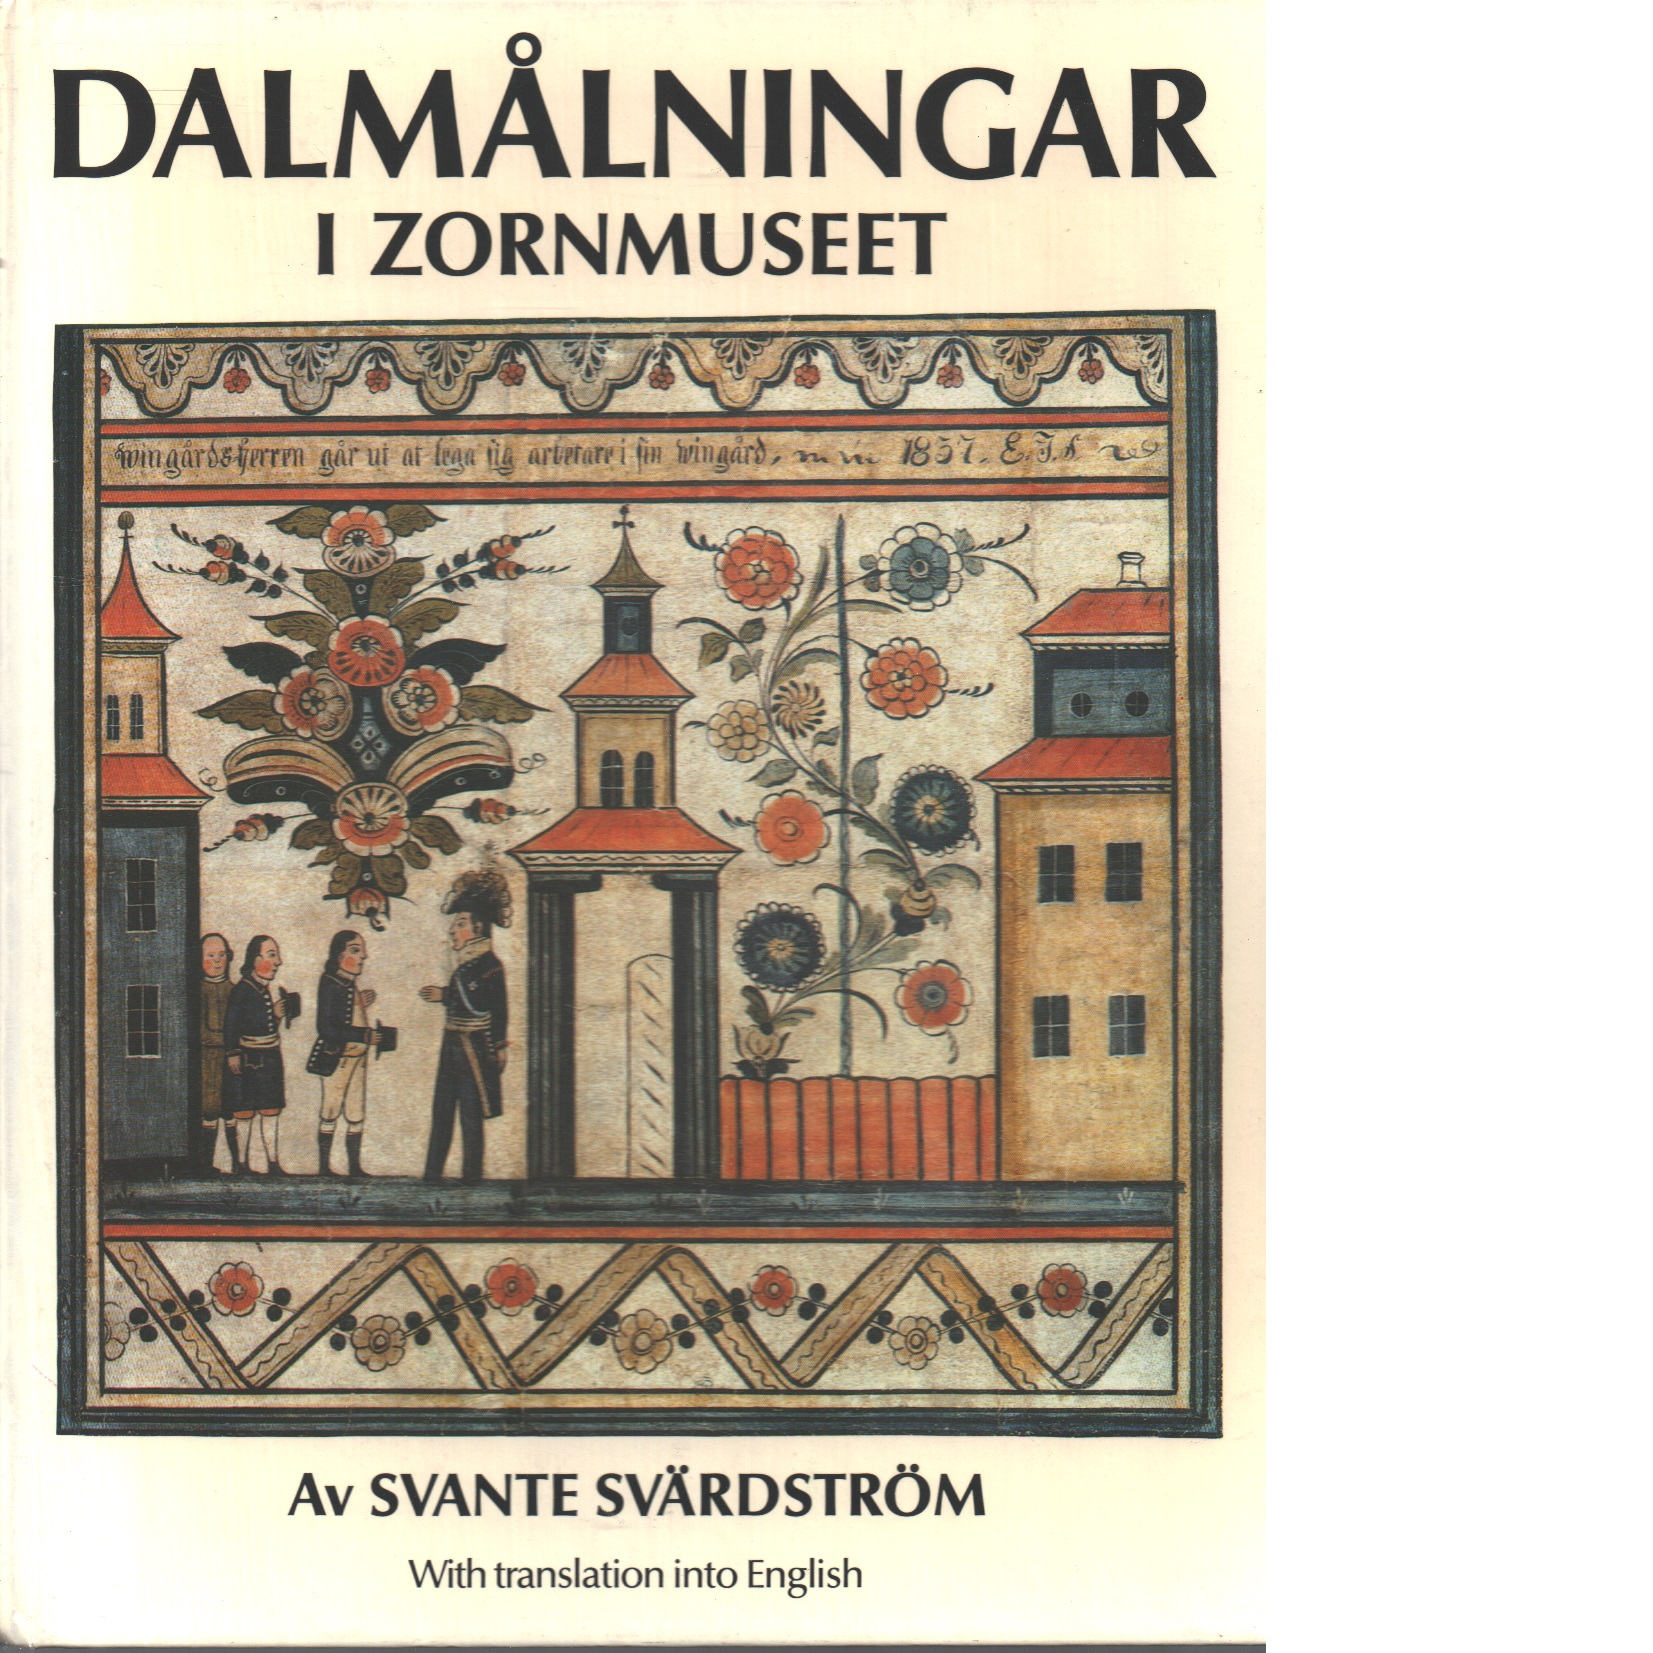 Dalmålningar i Zornmuseet - Svärdström, Svante